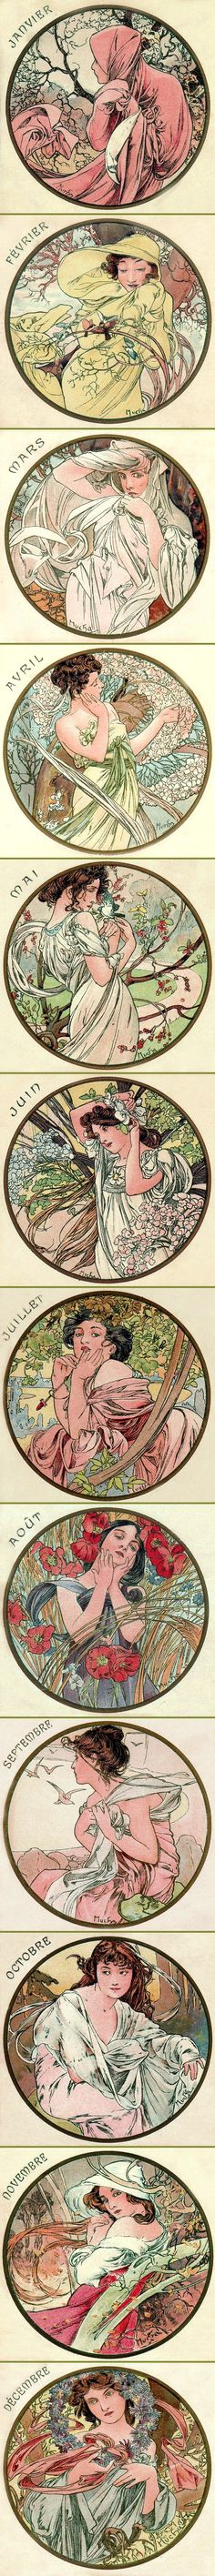 Alphonse Mucha - The Months (1899)